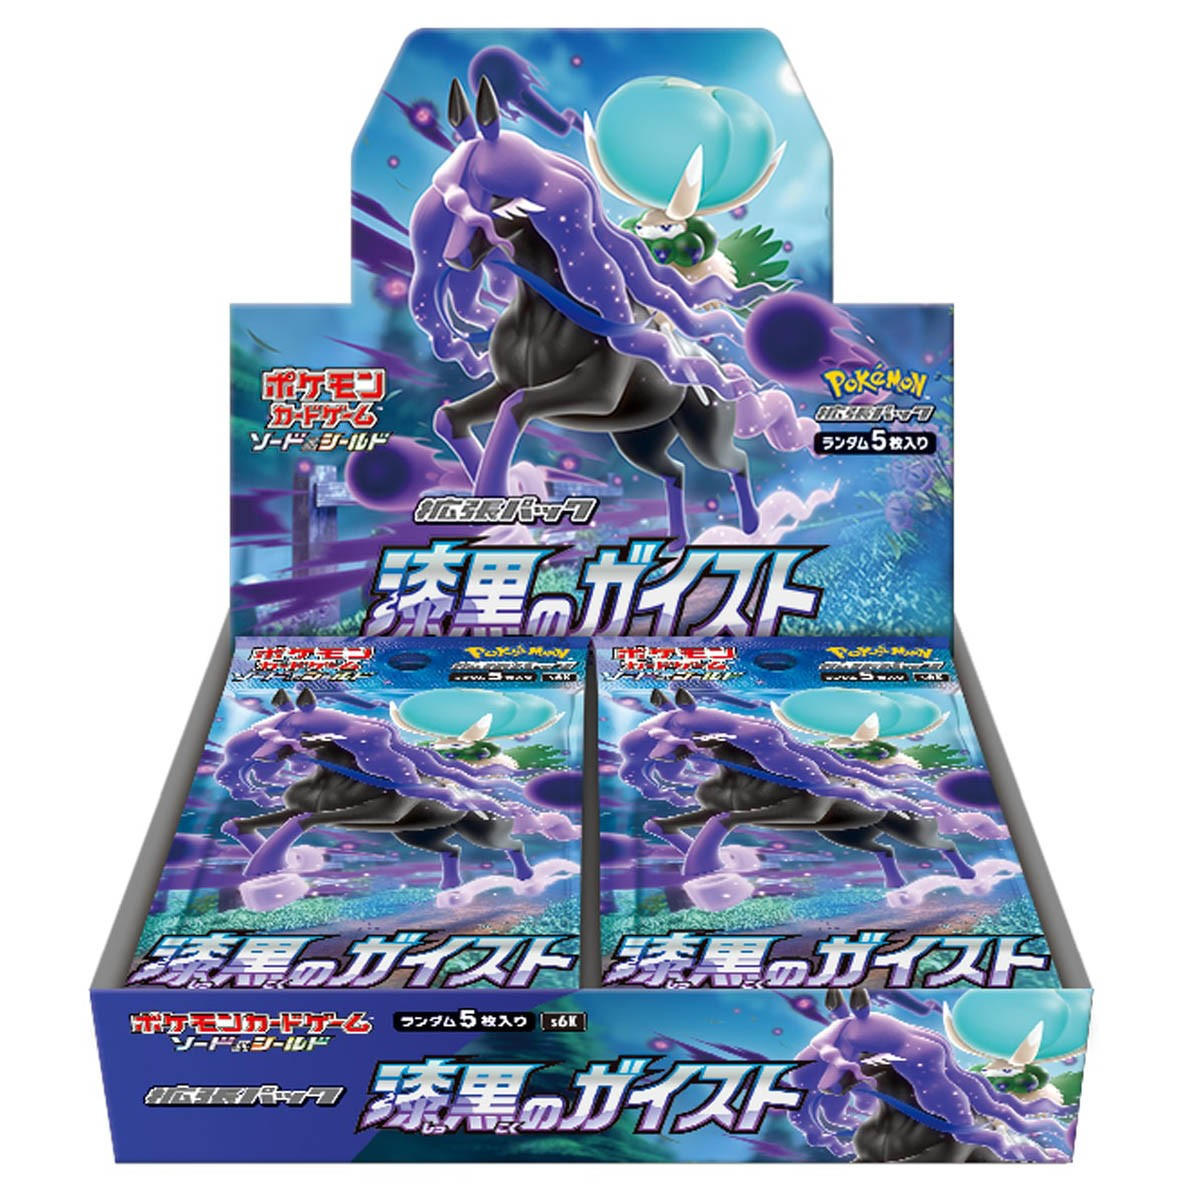 Pokemon box Jet Black Spirit 1 TuttoGiappone